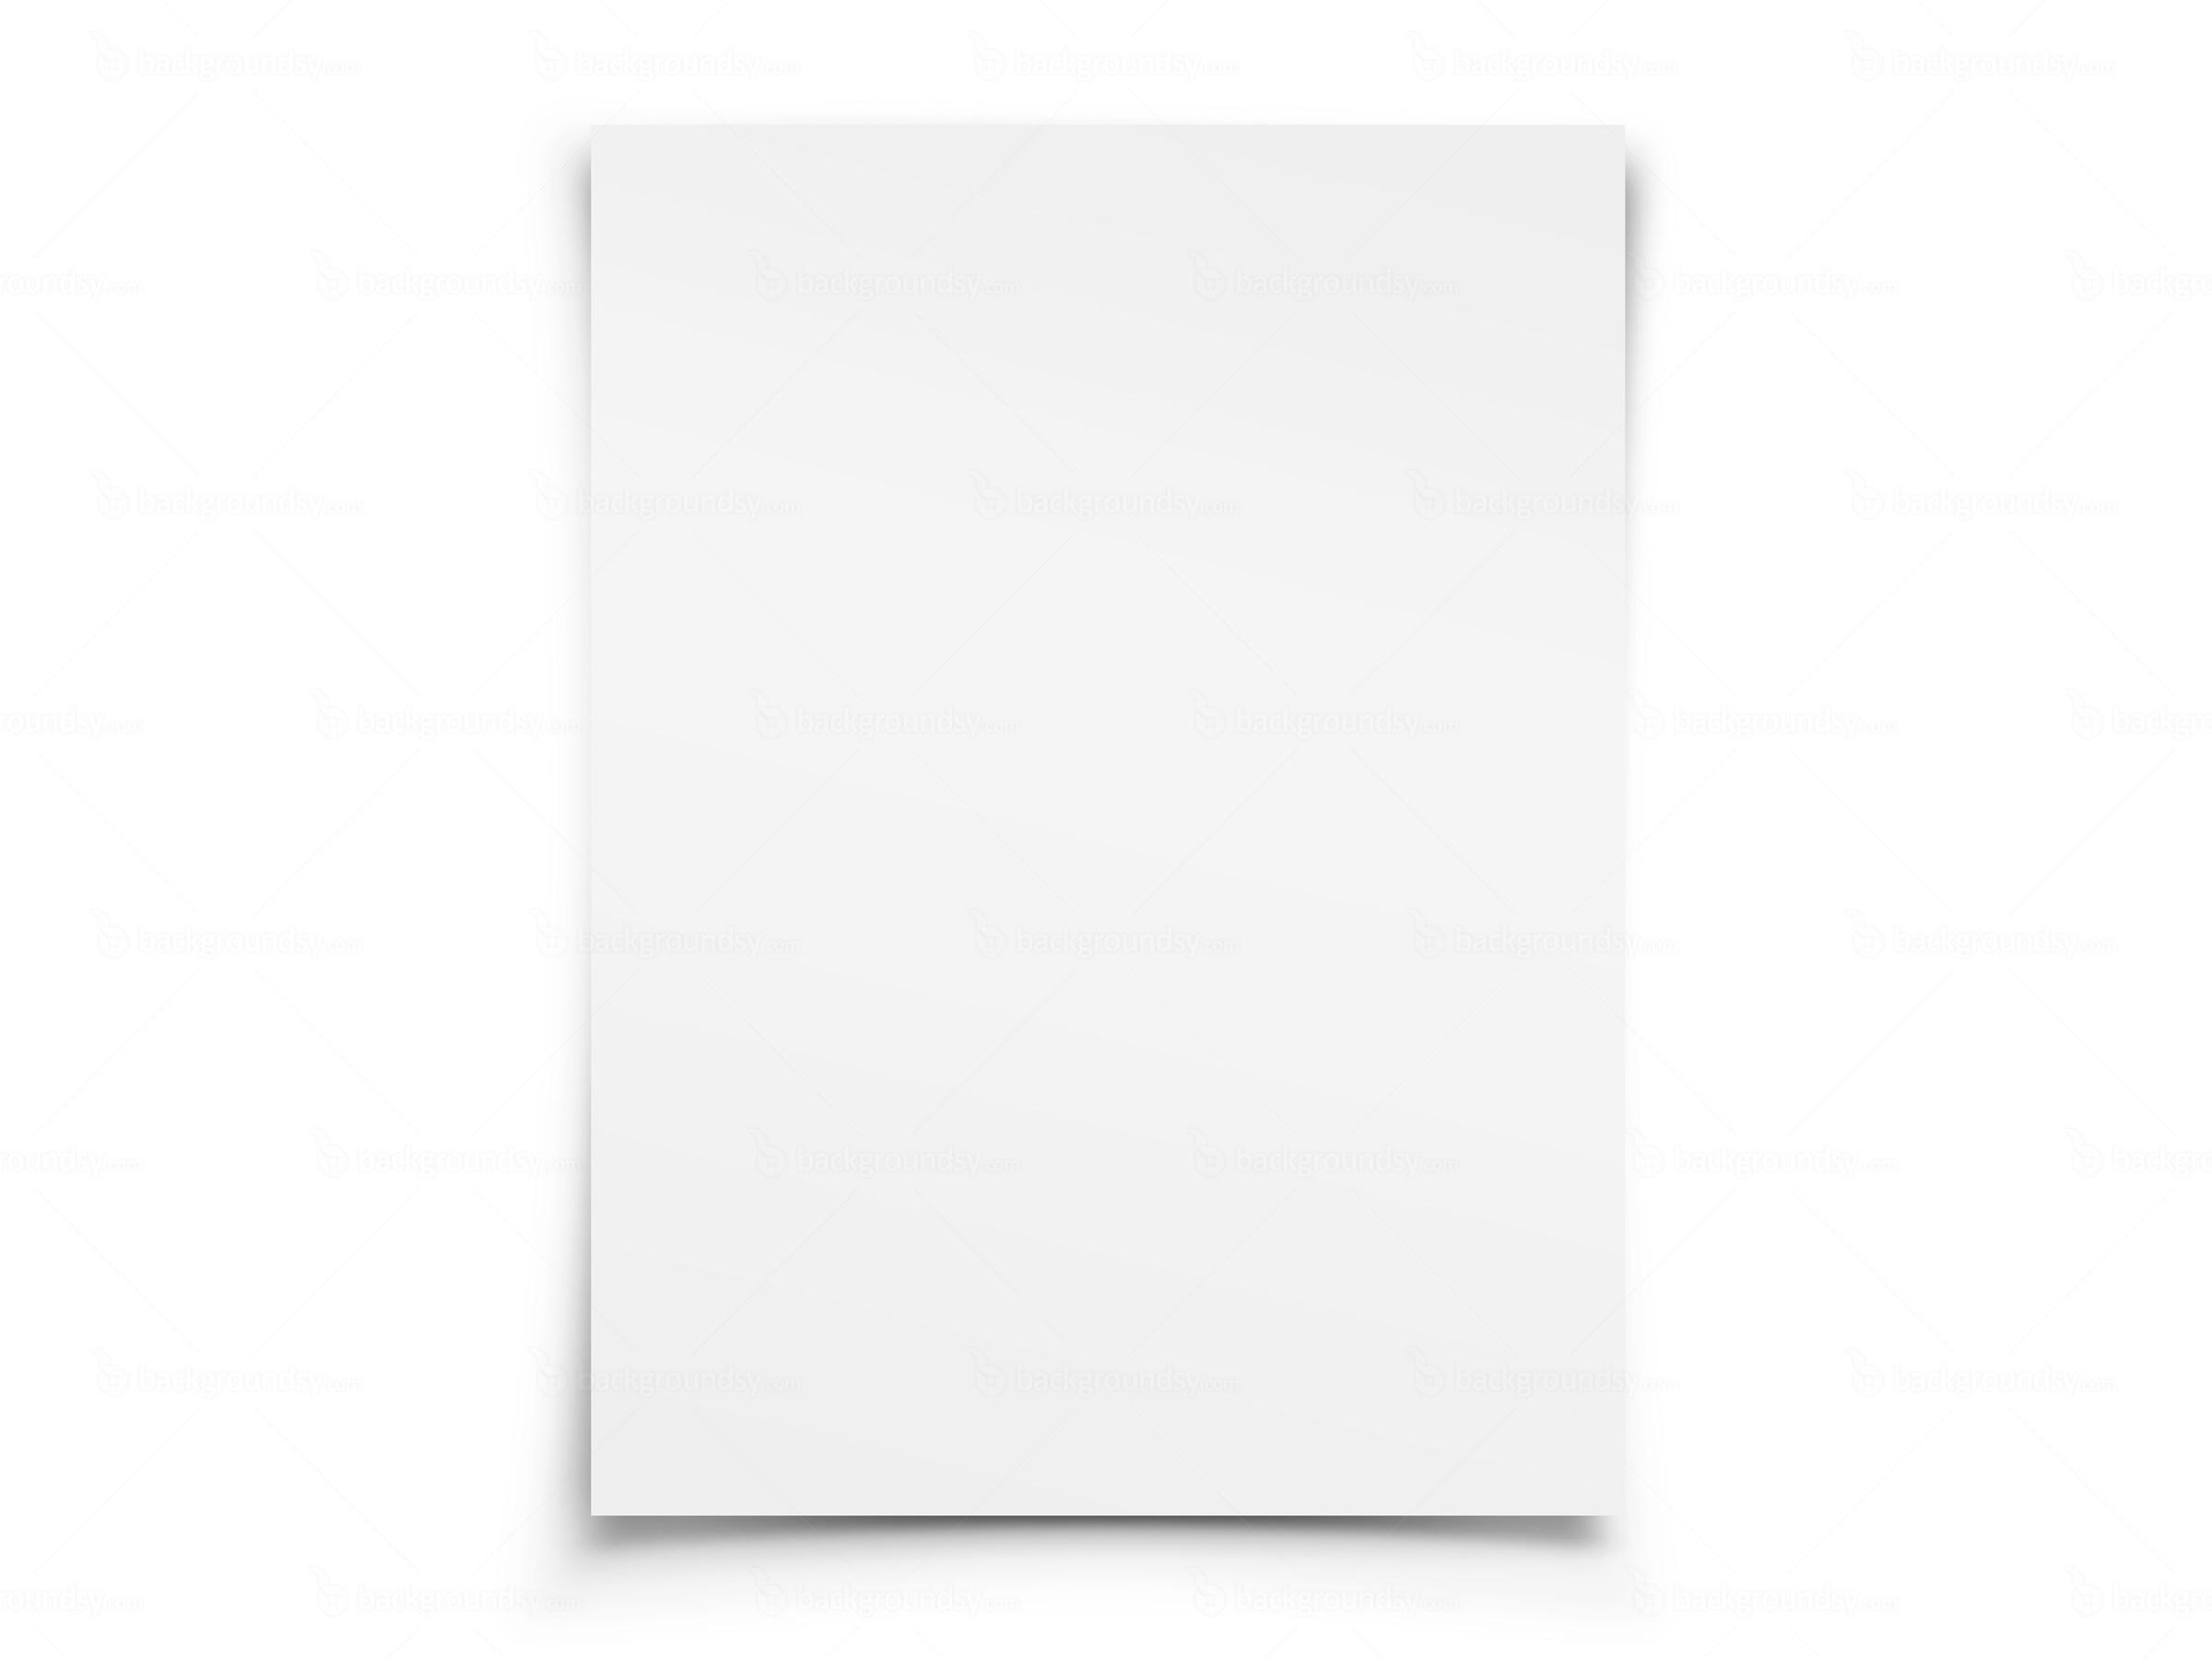 Free Photo: Blank Paper